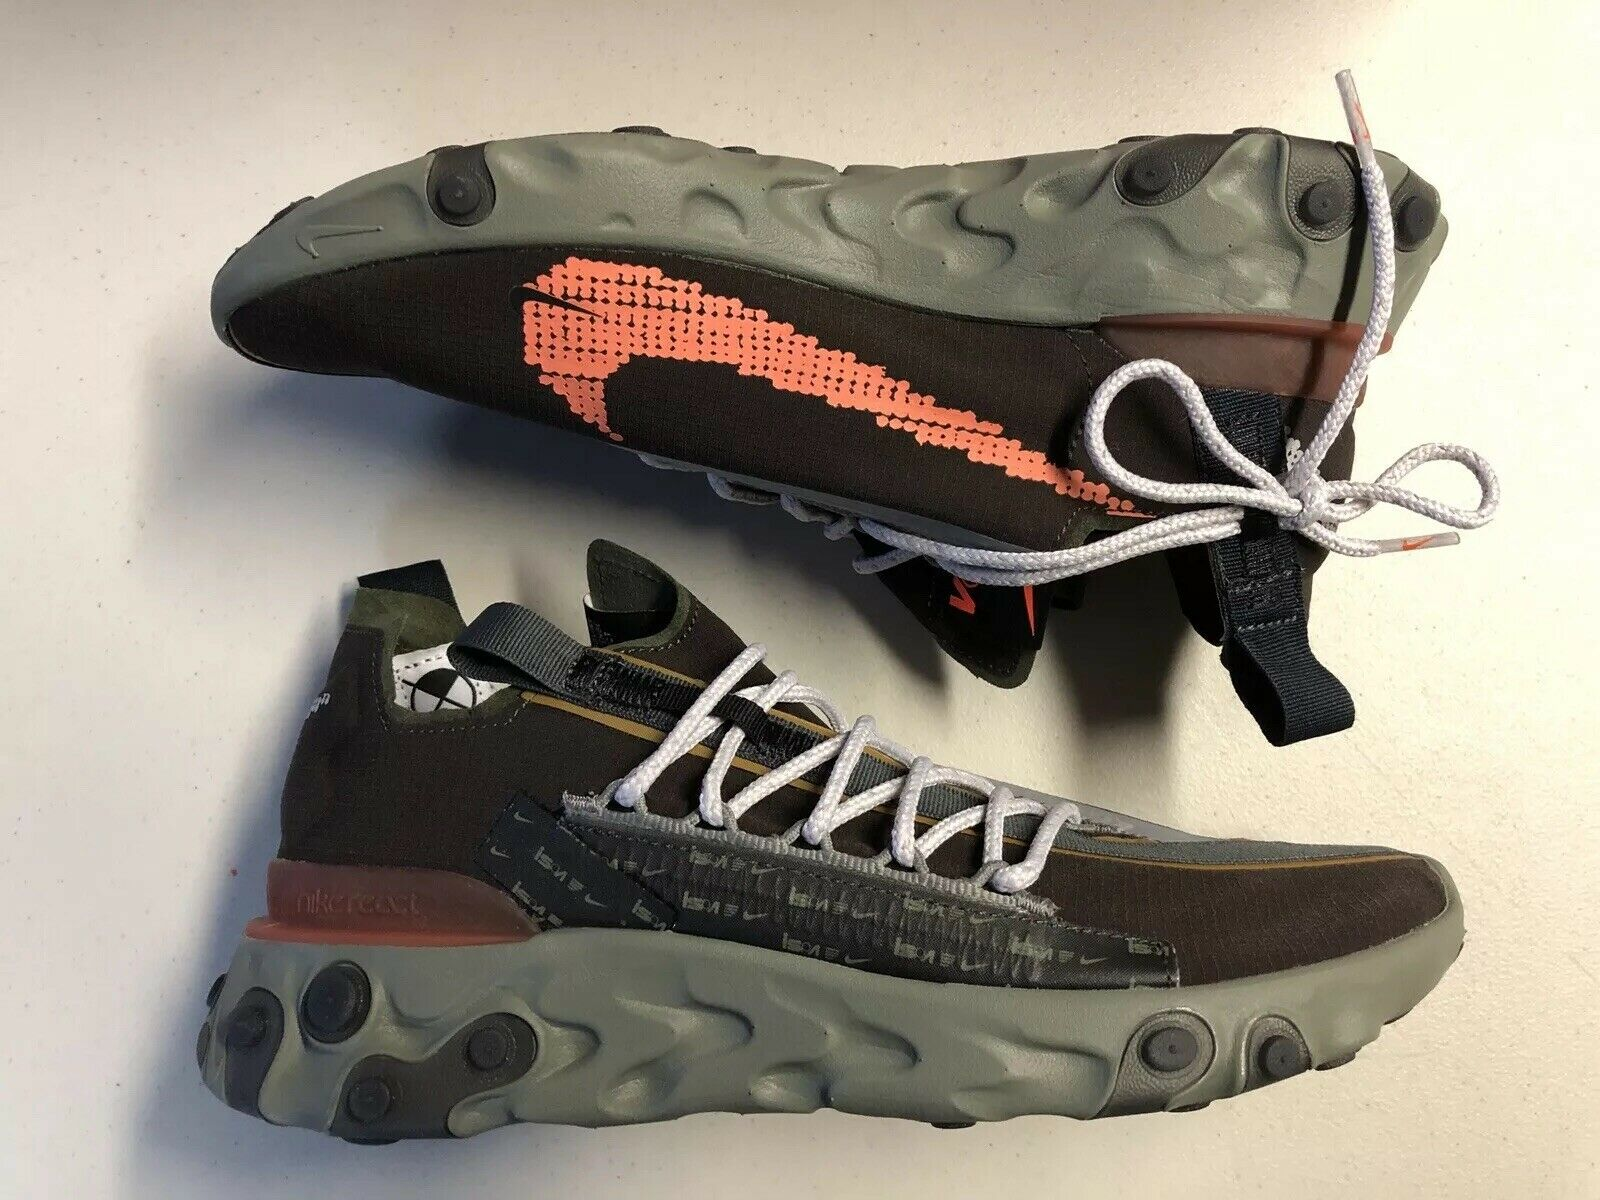 NIB Nike React WR ISPA Sz 8.5 Low Velvet Brown Terra orange AR8555-200 Runner